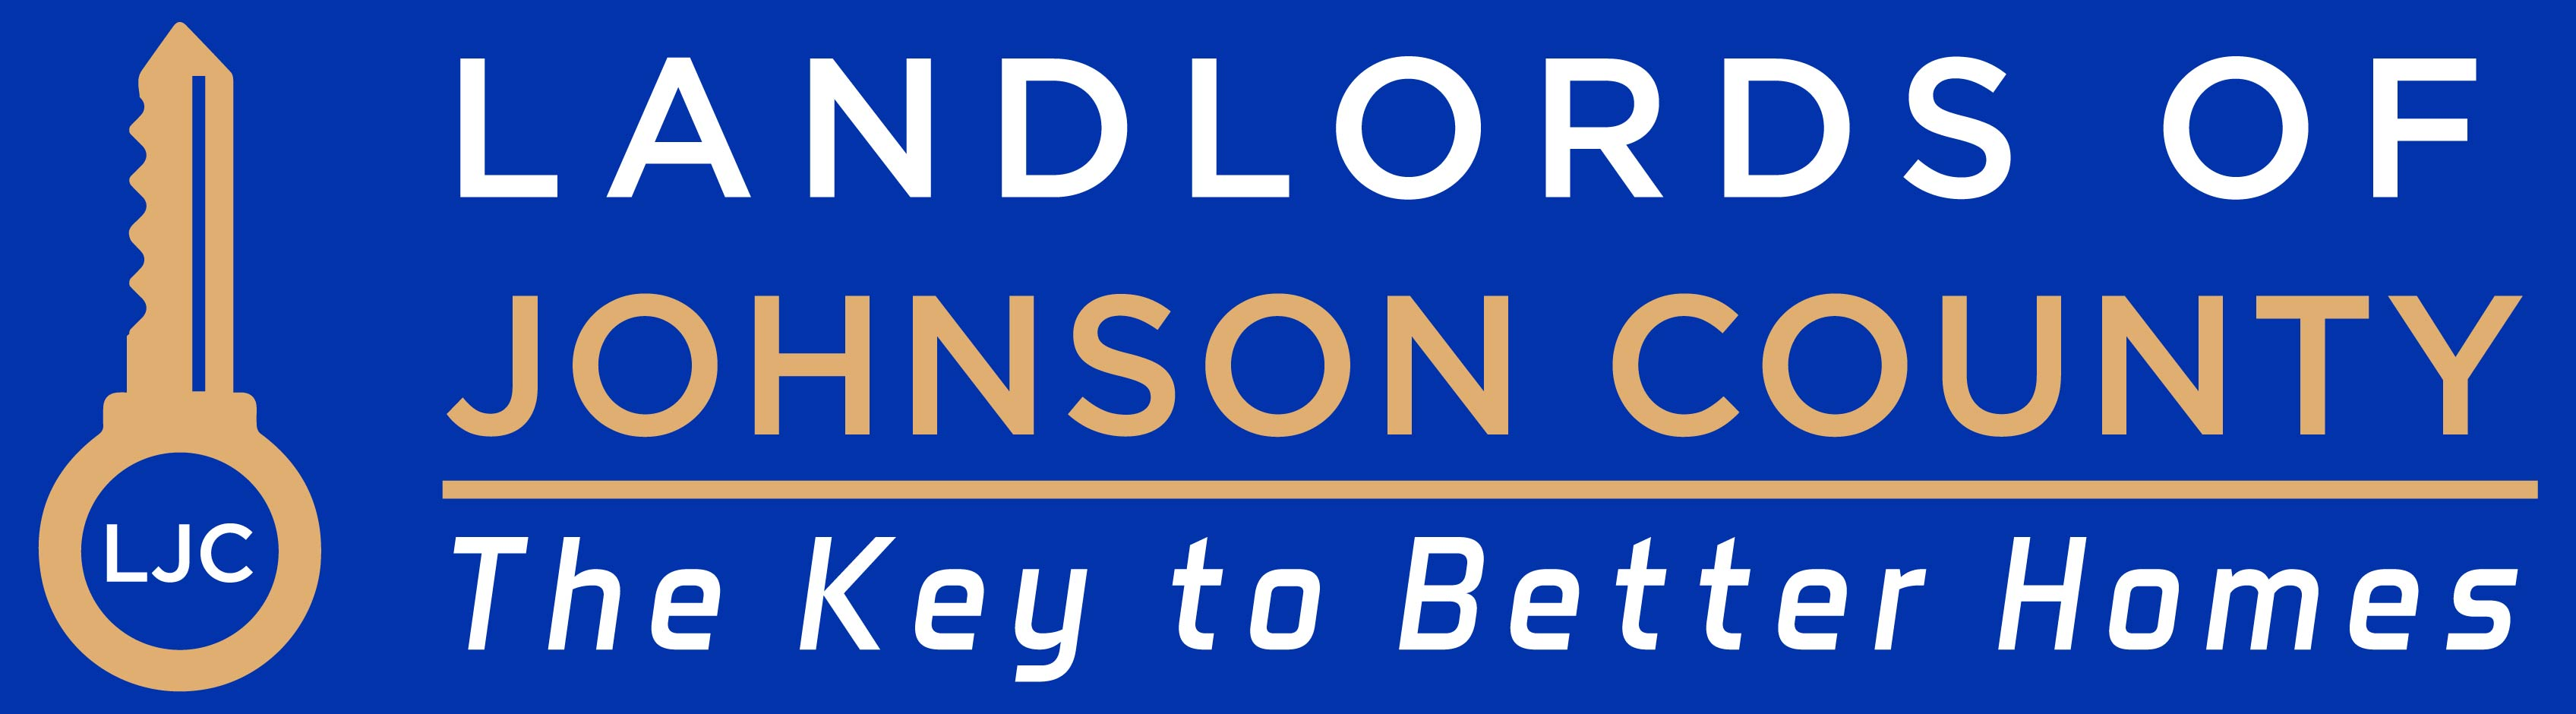 Landlords of Johnson County